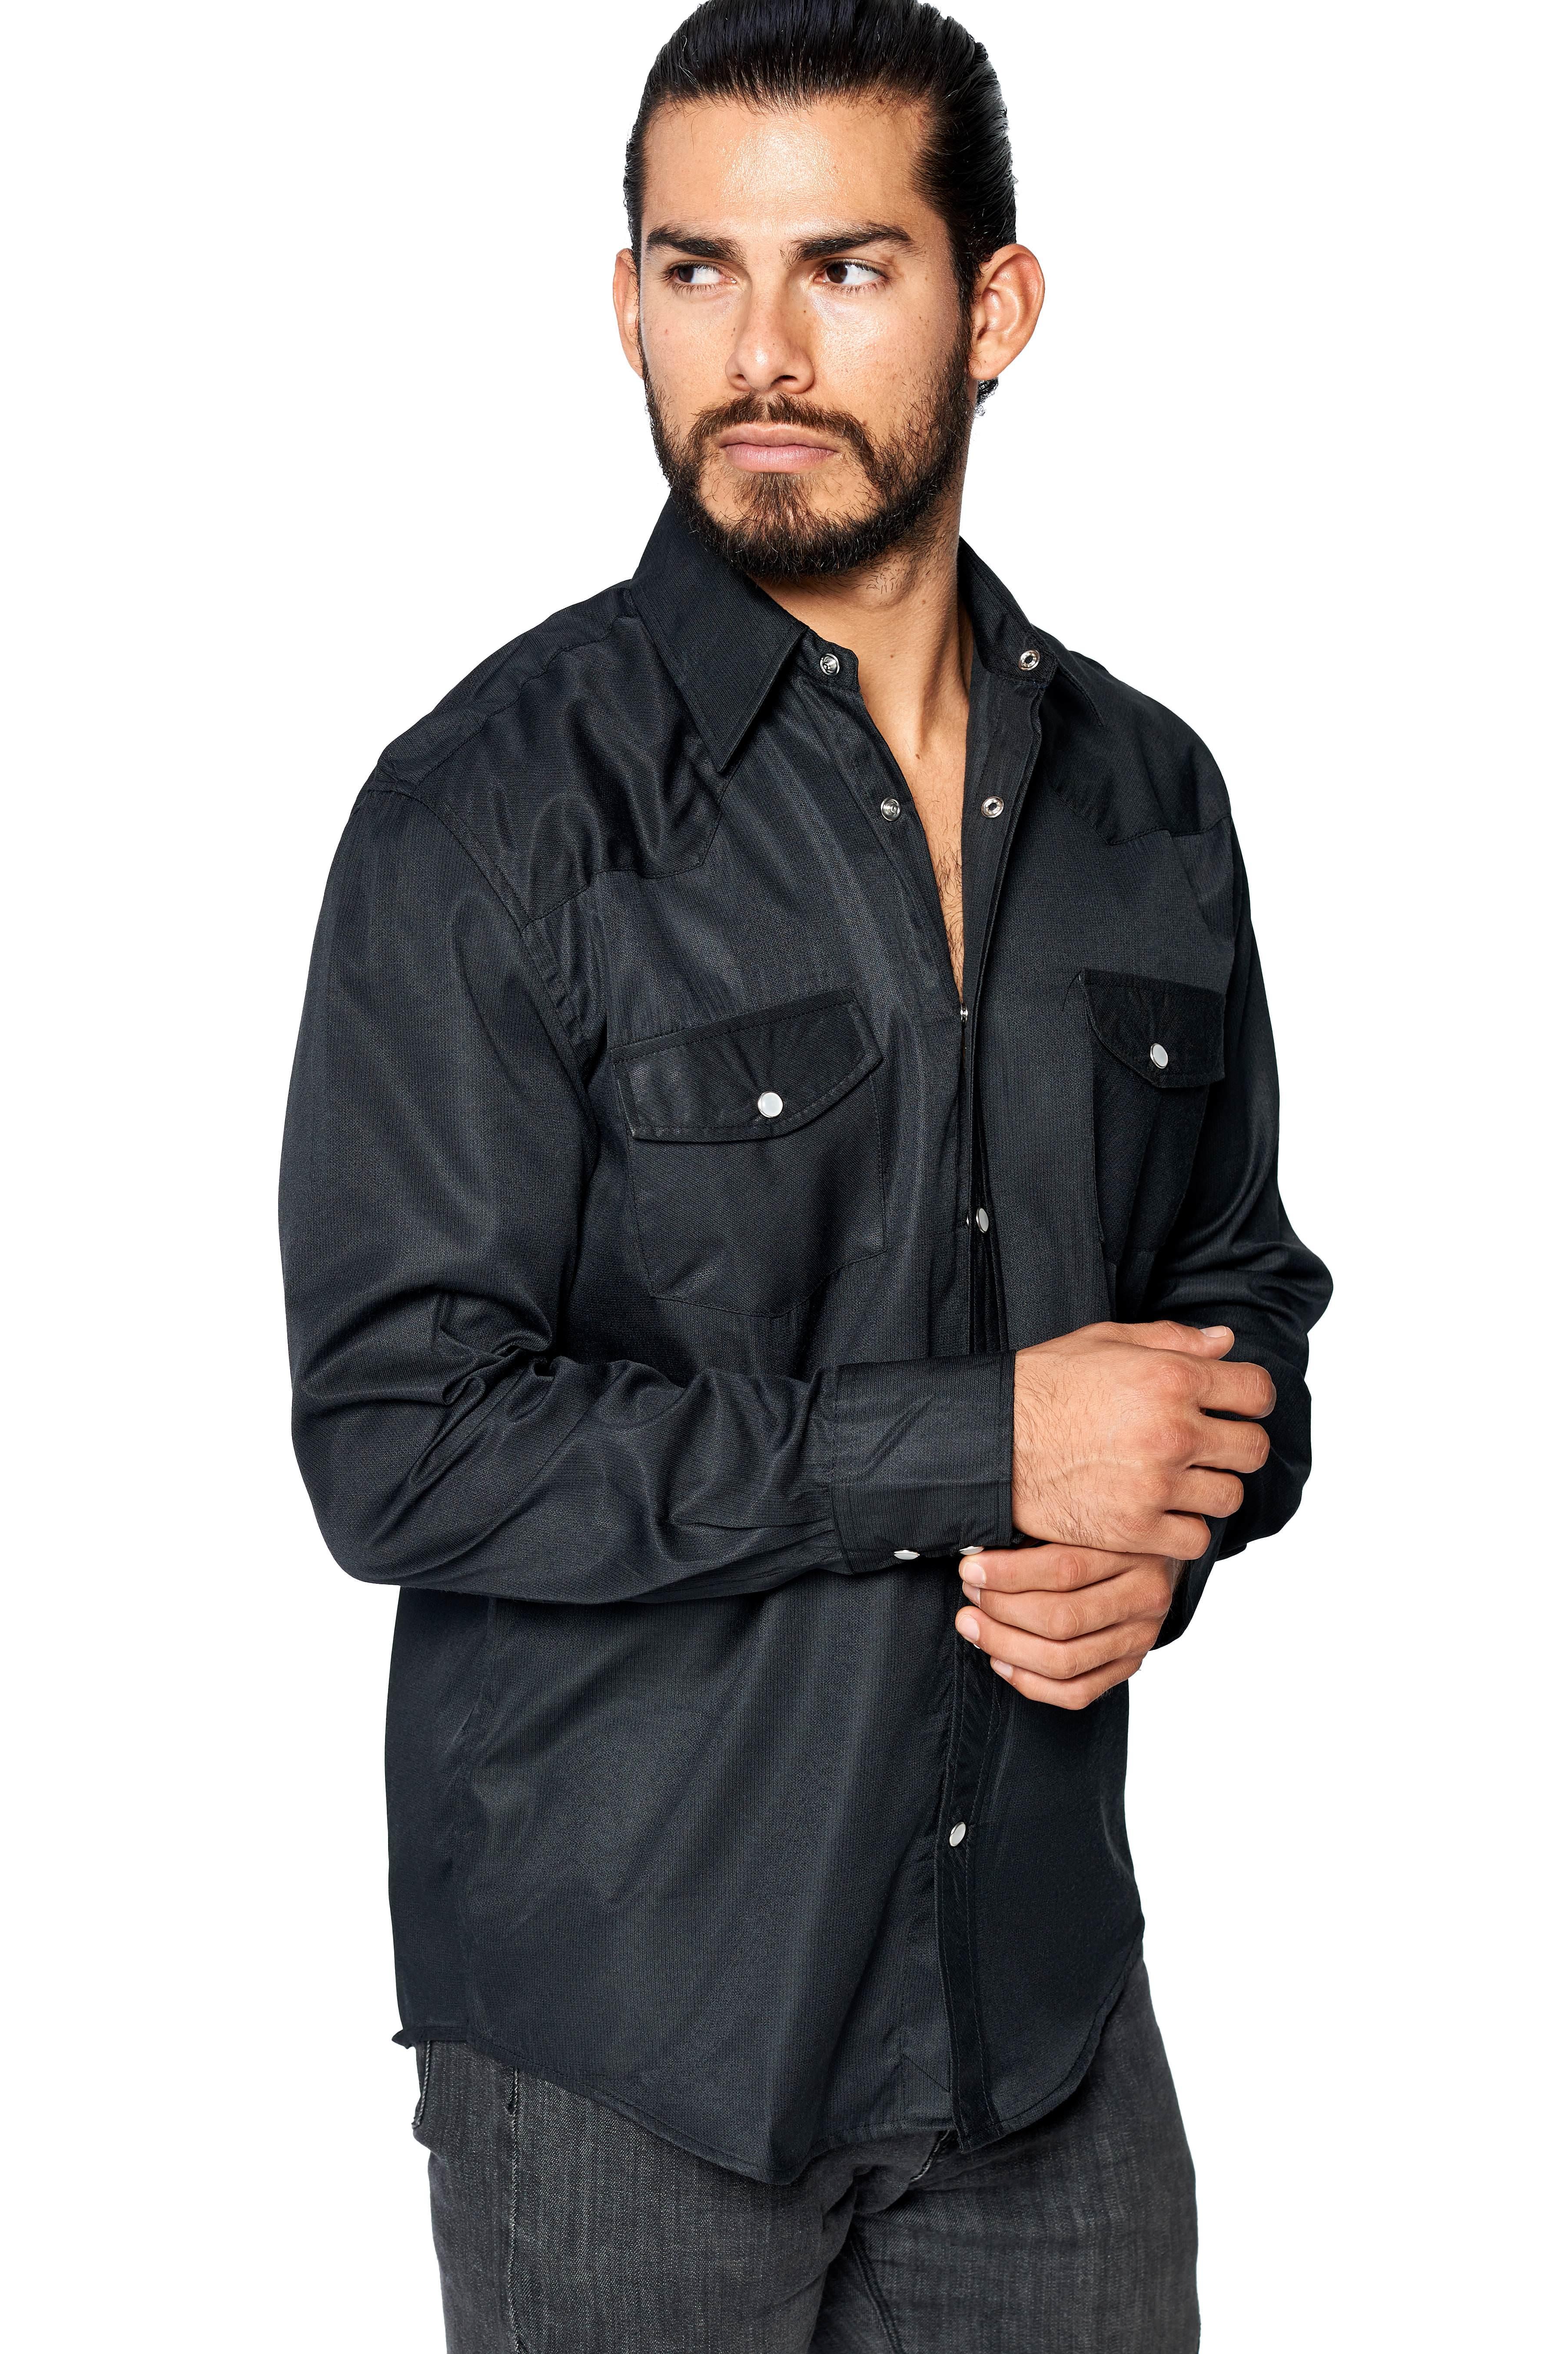 LW-Men-039-s-Pearl-Snap-Tribal-Stylish-Printed-Woven-Western-Vaquero-Rodeo-Shirt thumbnail 51